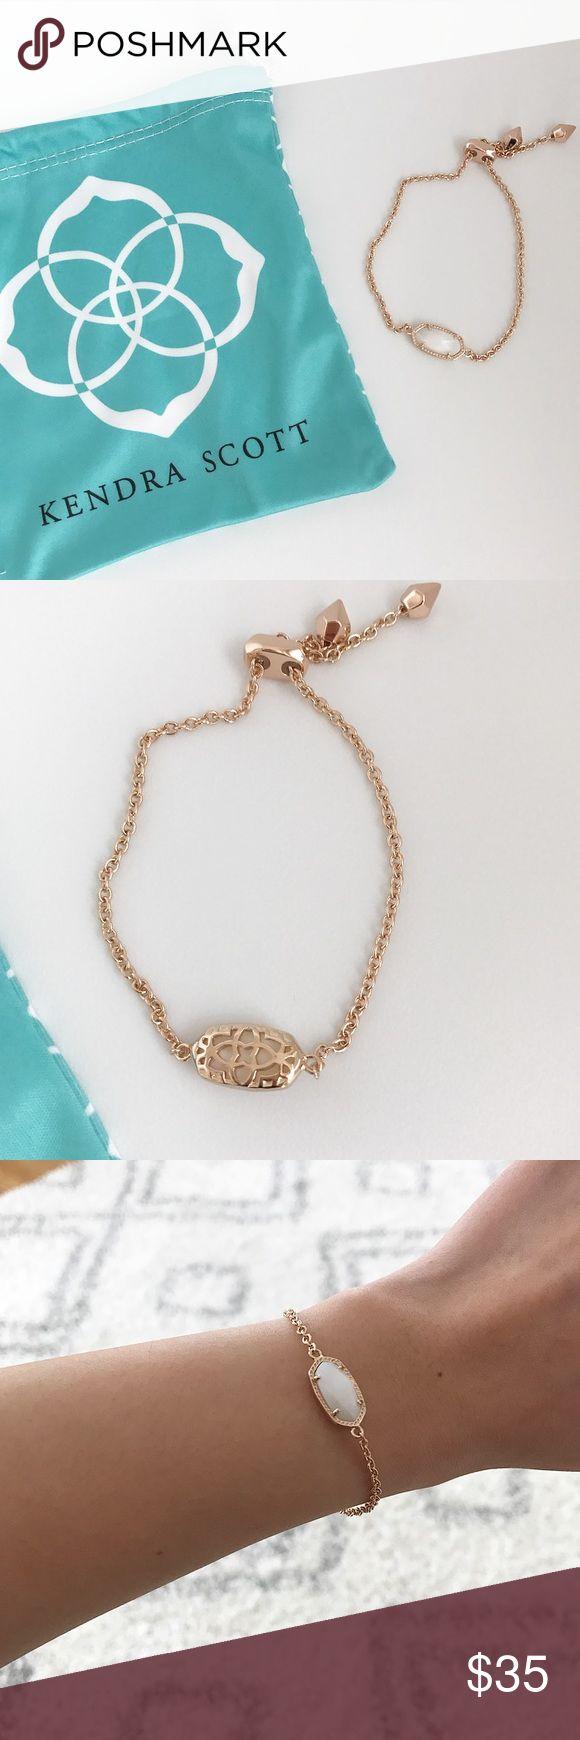 Kendra Scott Elaina Rose Gold Bracelet Kendra Scott Elaina Rose Gold bracelet in white pearl. Sliding closure for the perfect fit. •No trades. •No paypal. •Instagram: CitrusandLavenderLane Kendra Scott Jewelry Bracelets